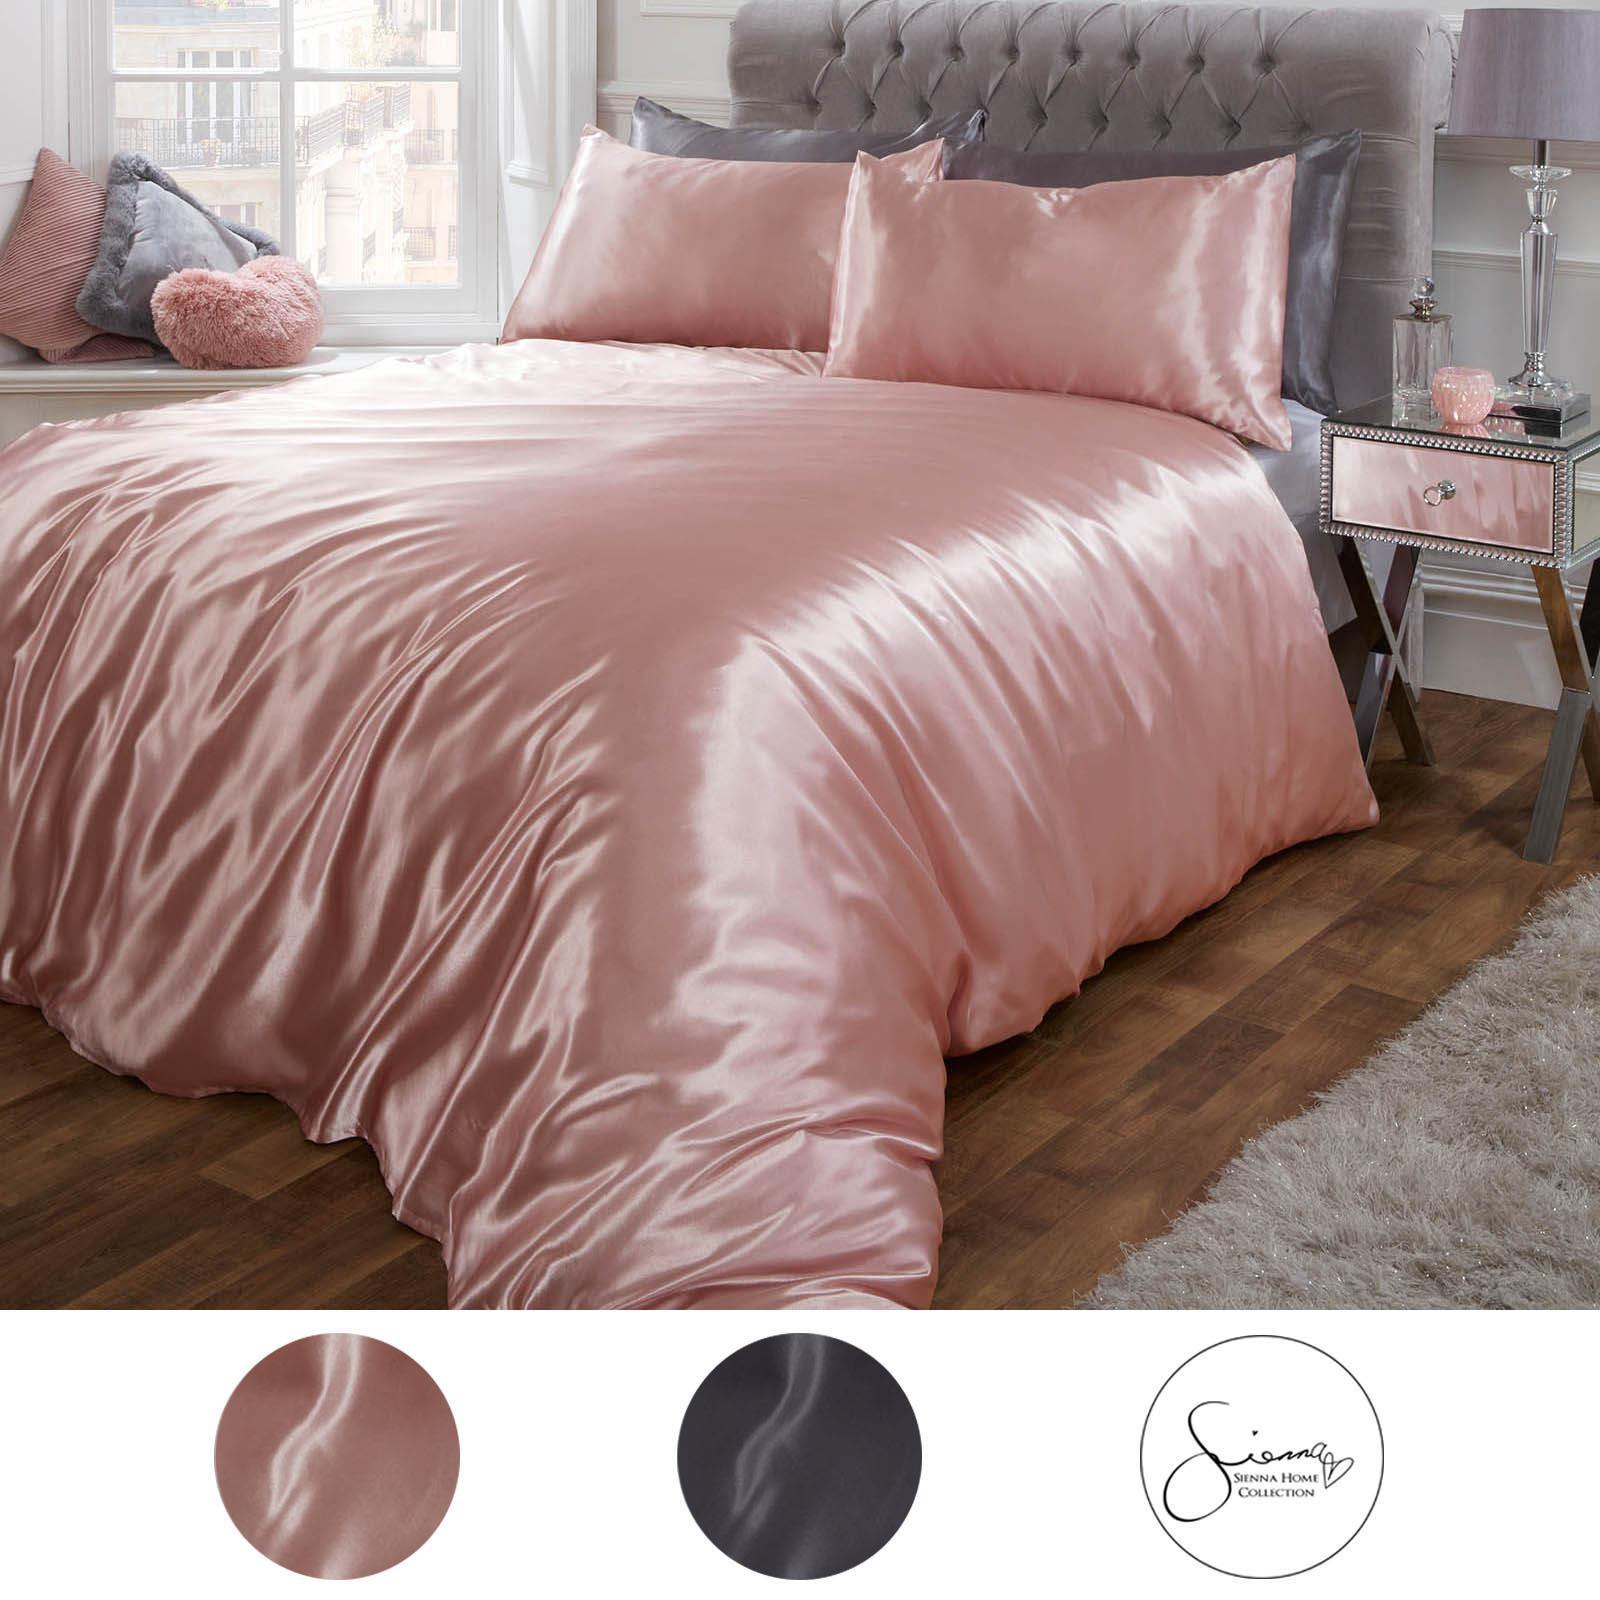 Sienna Satin Silk Duvet Cover With Pillowcases Bedding Set Blush Pink Silver Ebay